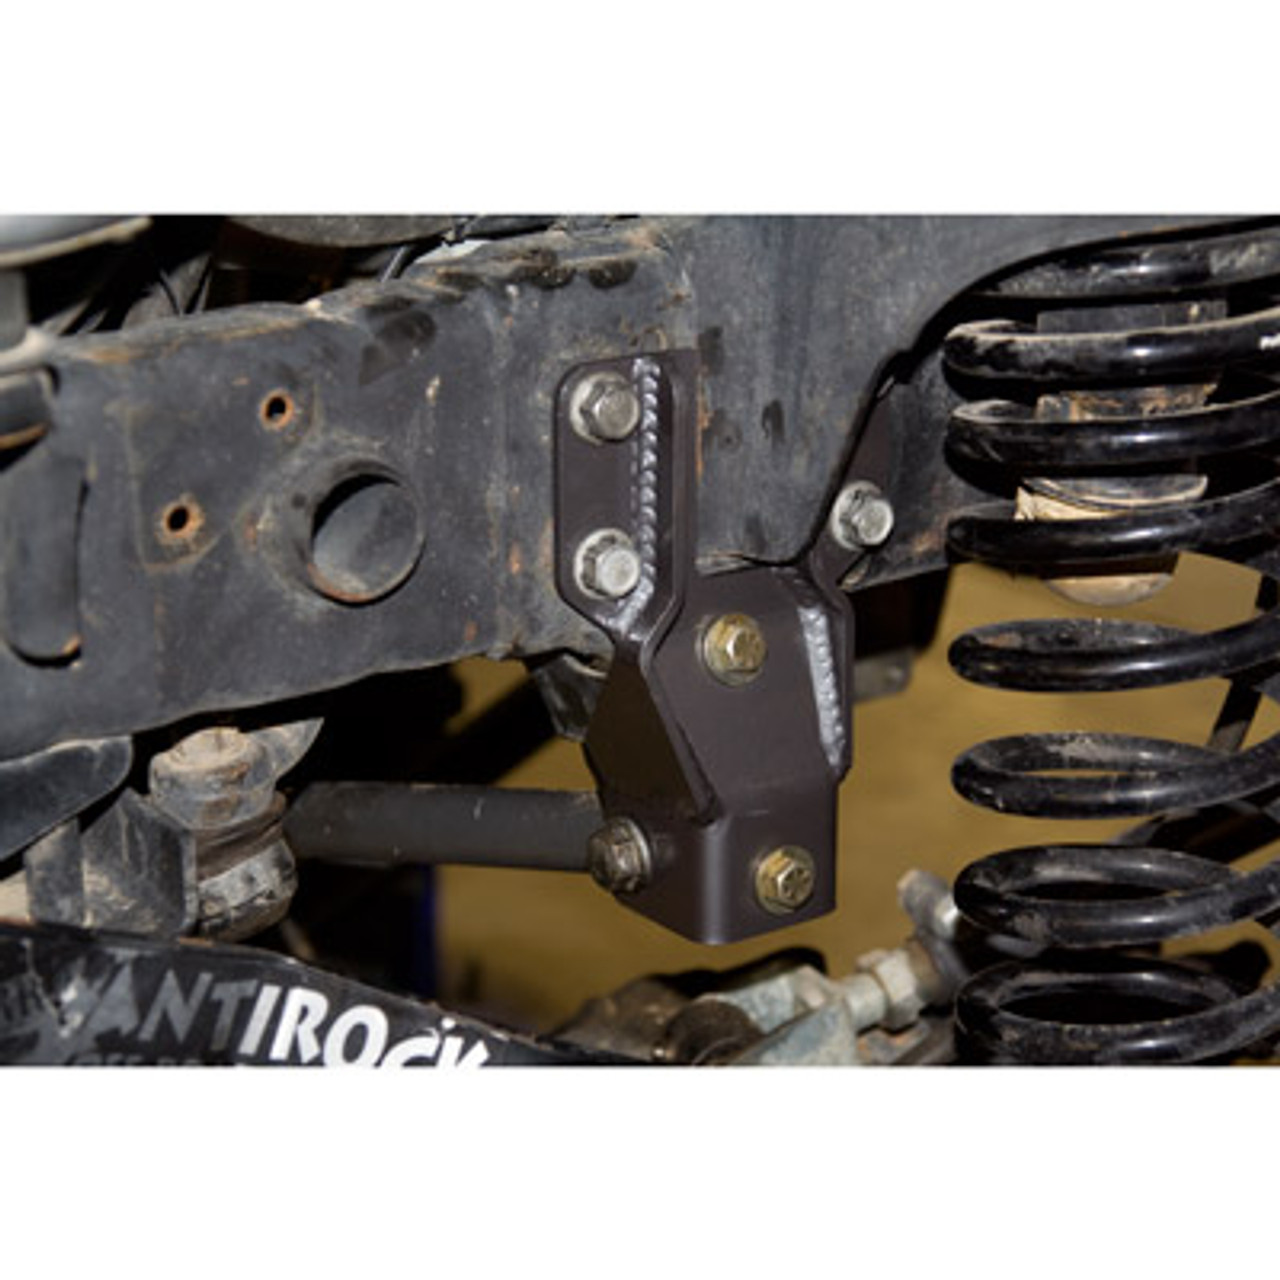 Synergy 8069-01 Front Track Bar Brace for Jeep Wrangler JK 2007+